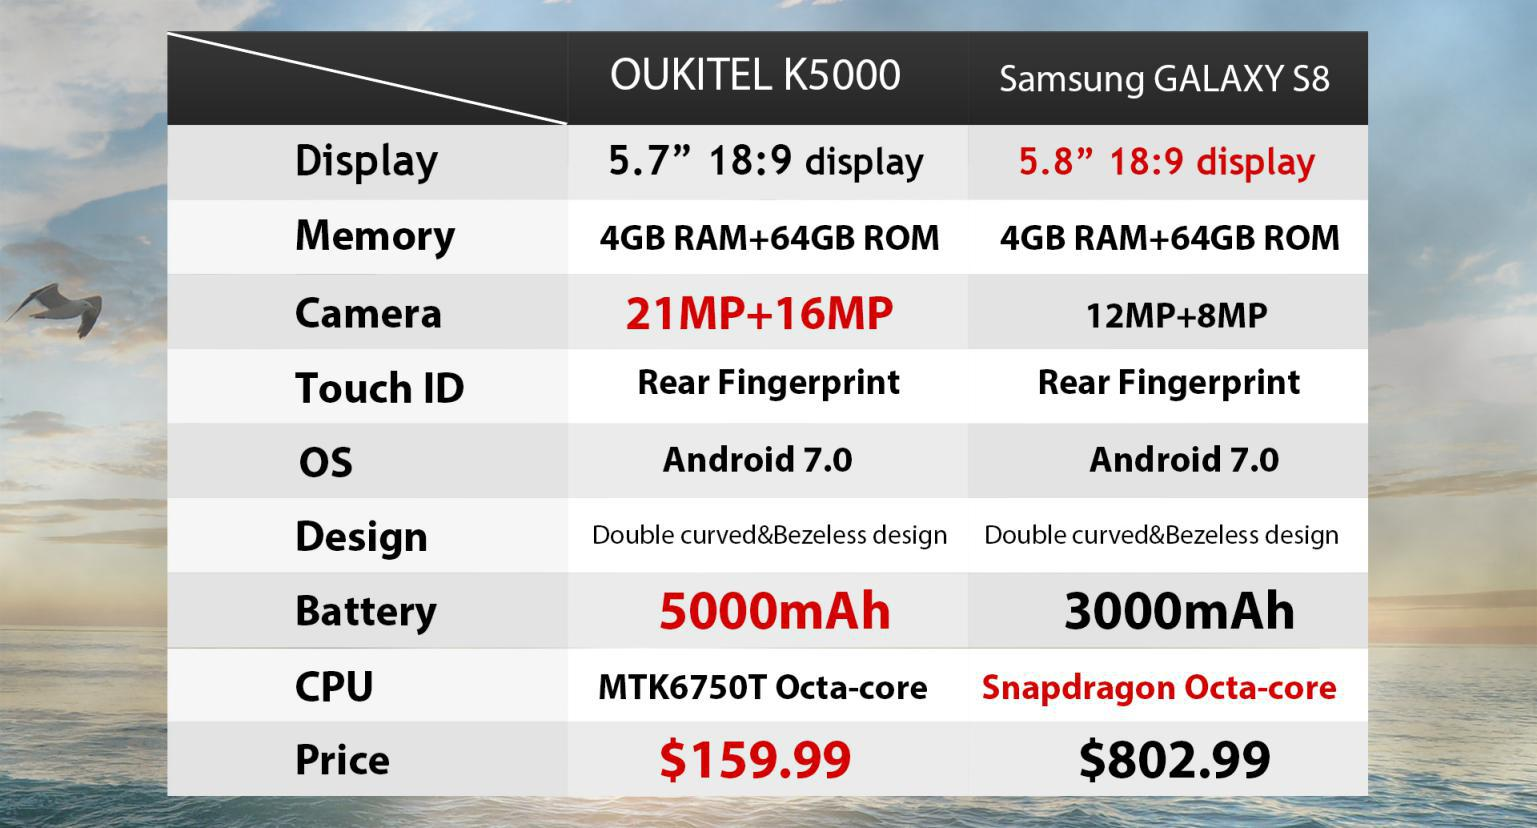 oukitel-k5000-vs-samsung-galaxy-s8-04